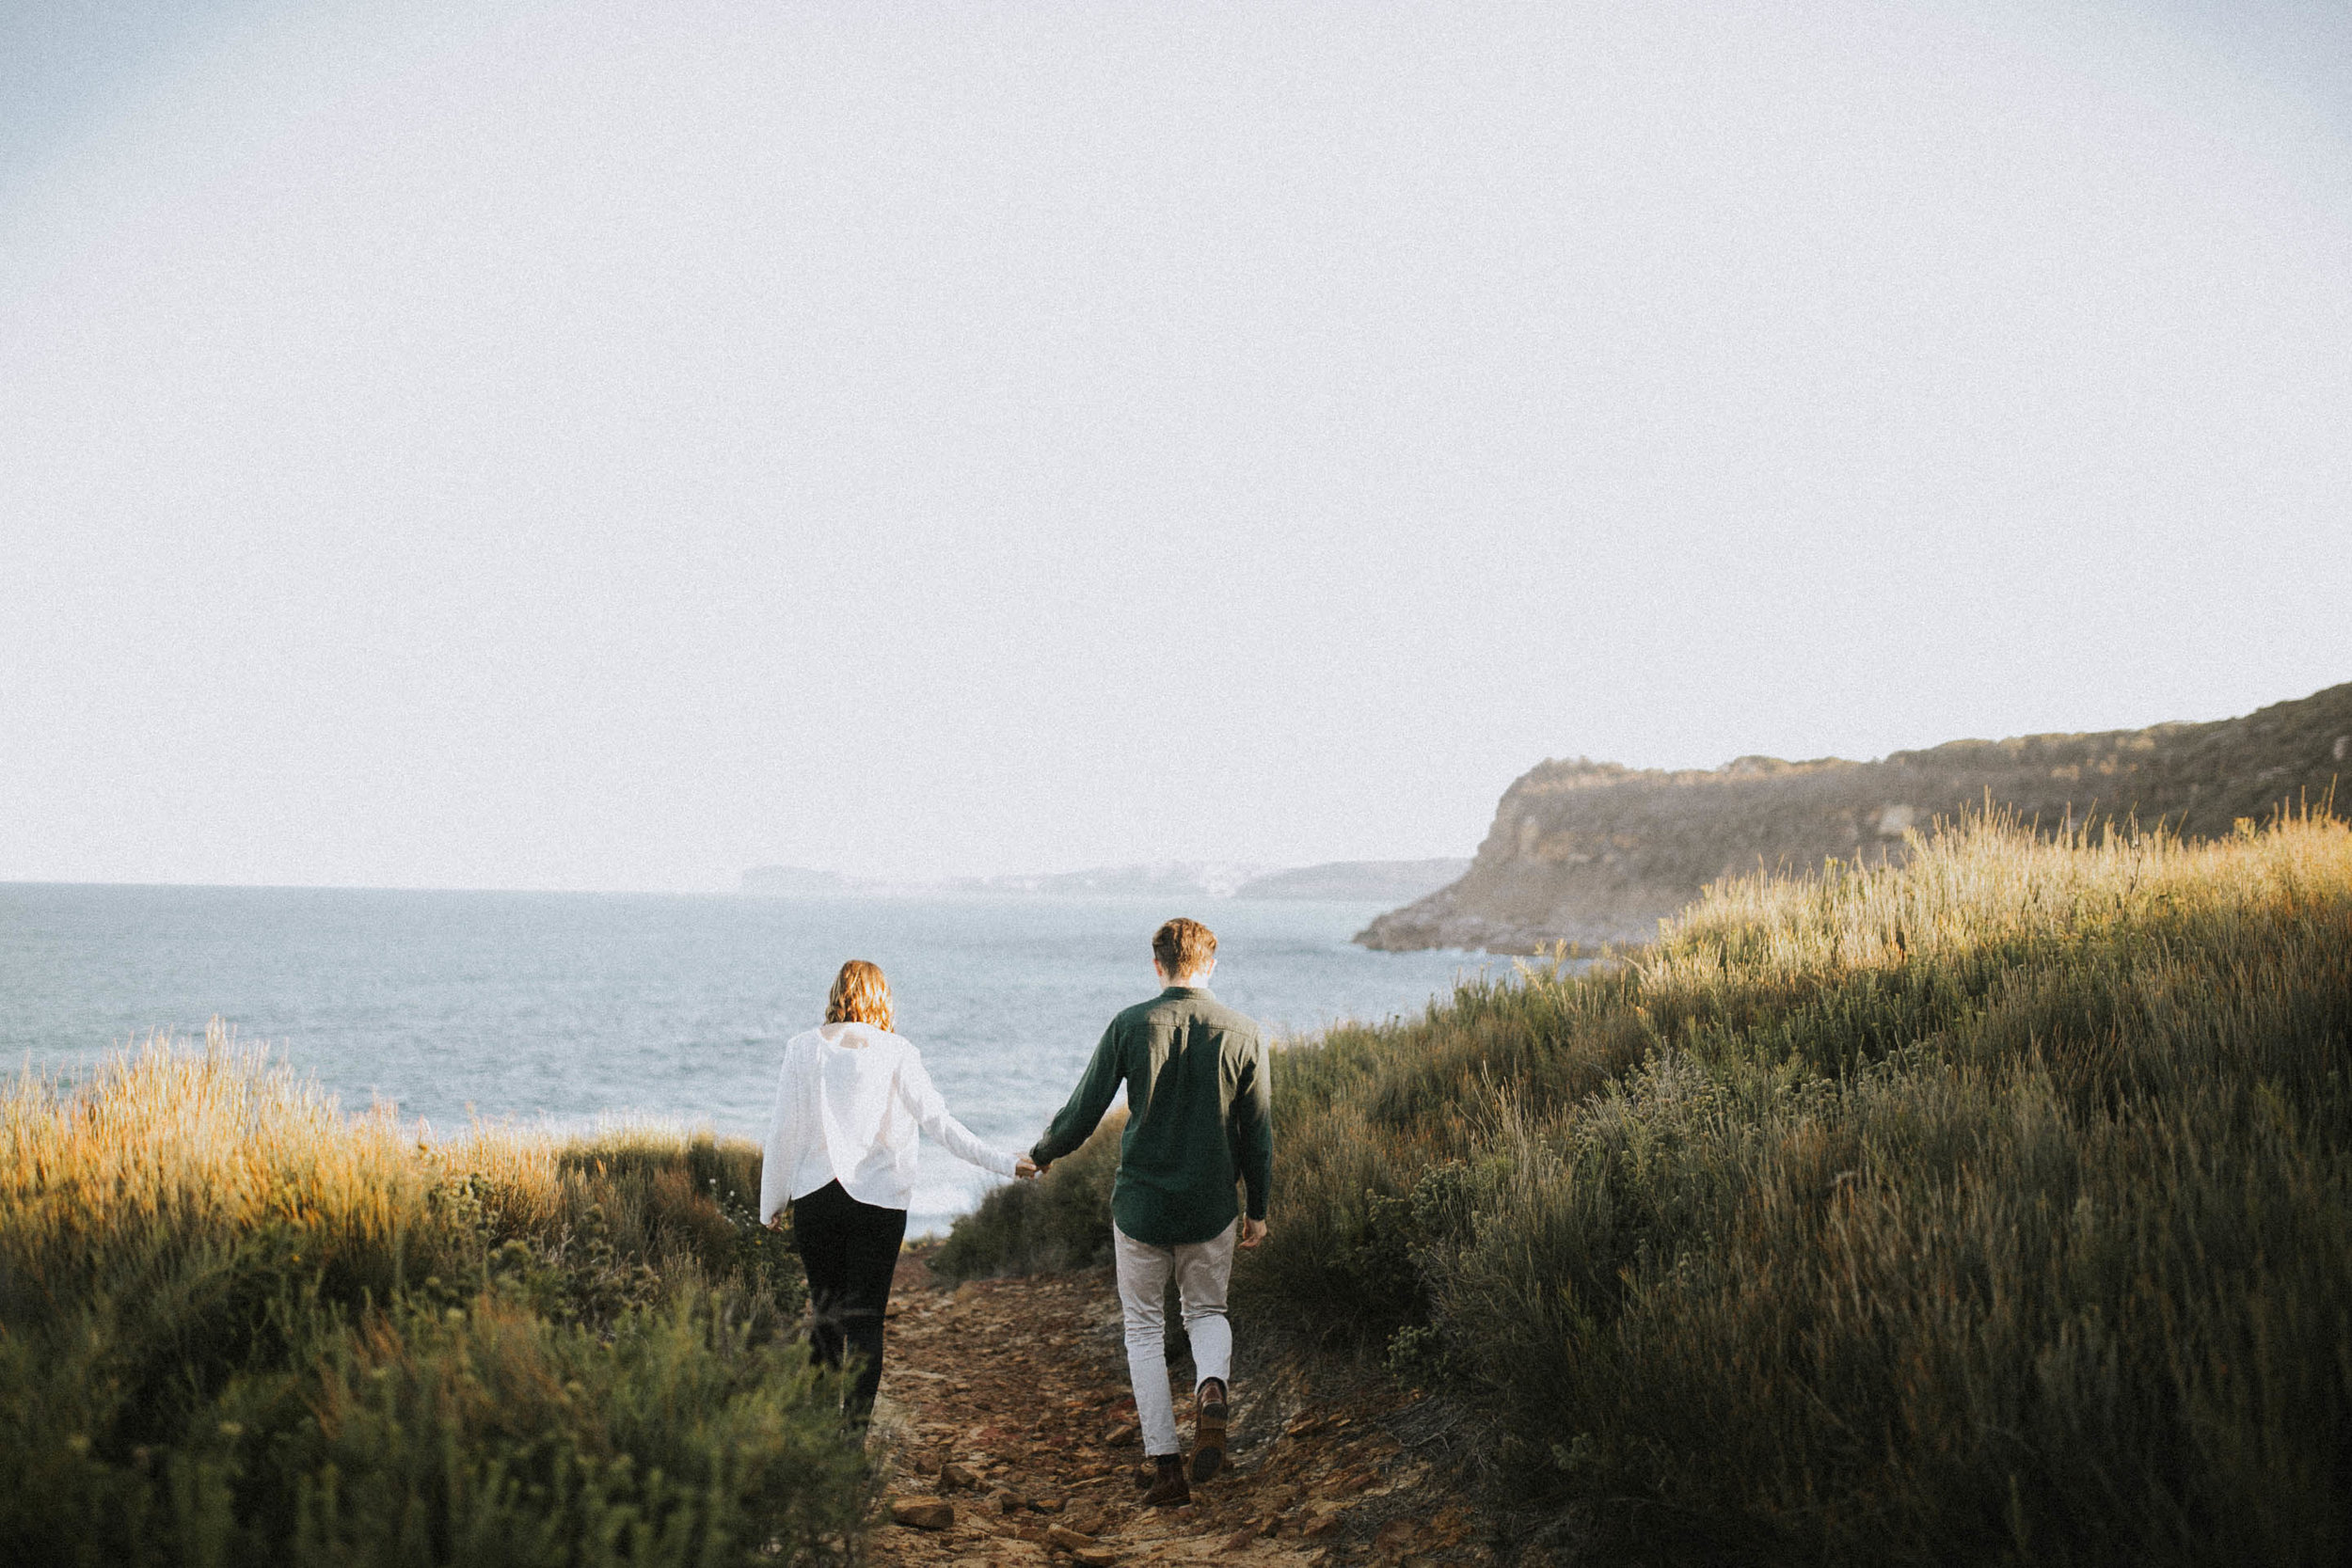 Bronte_Tom_Box_Head_Central_Coast_NSW_Wedding-22.jpg